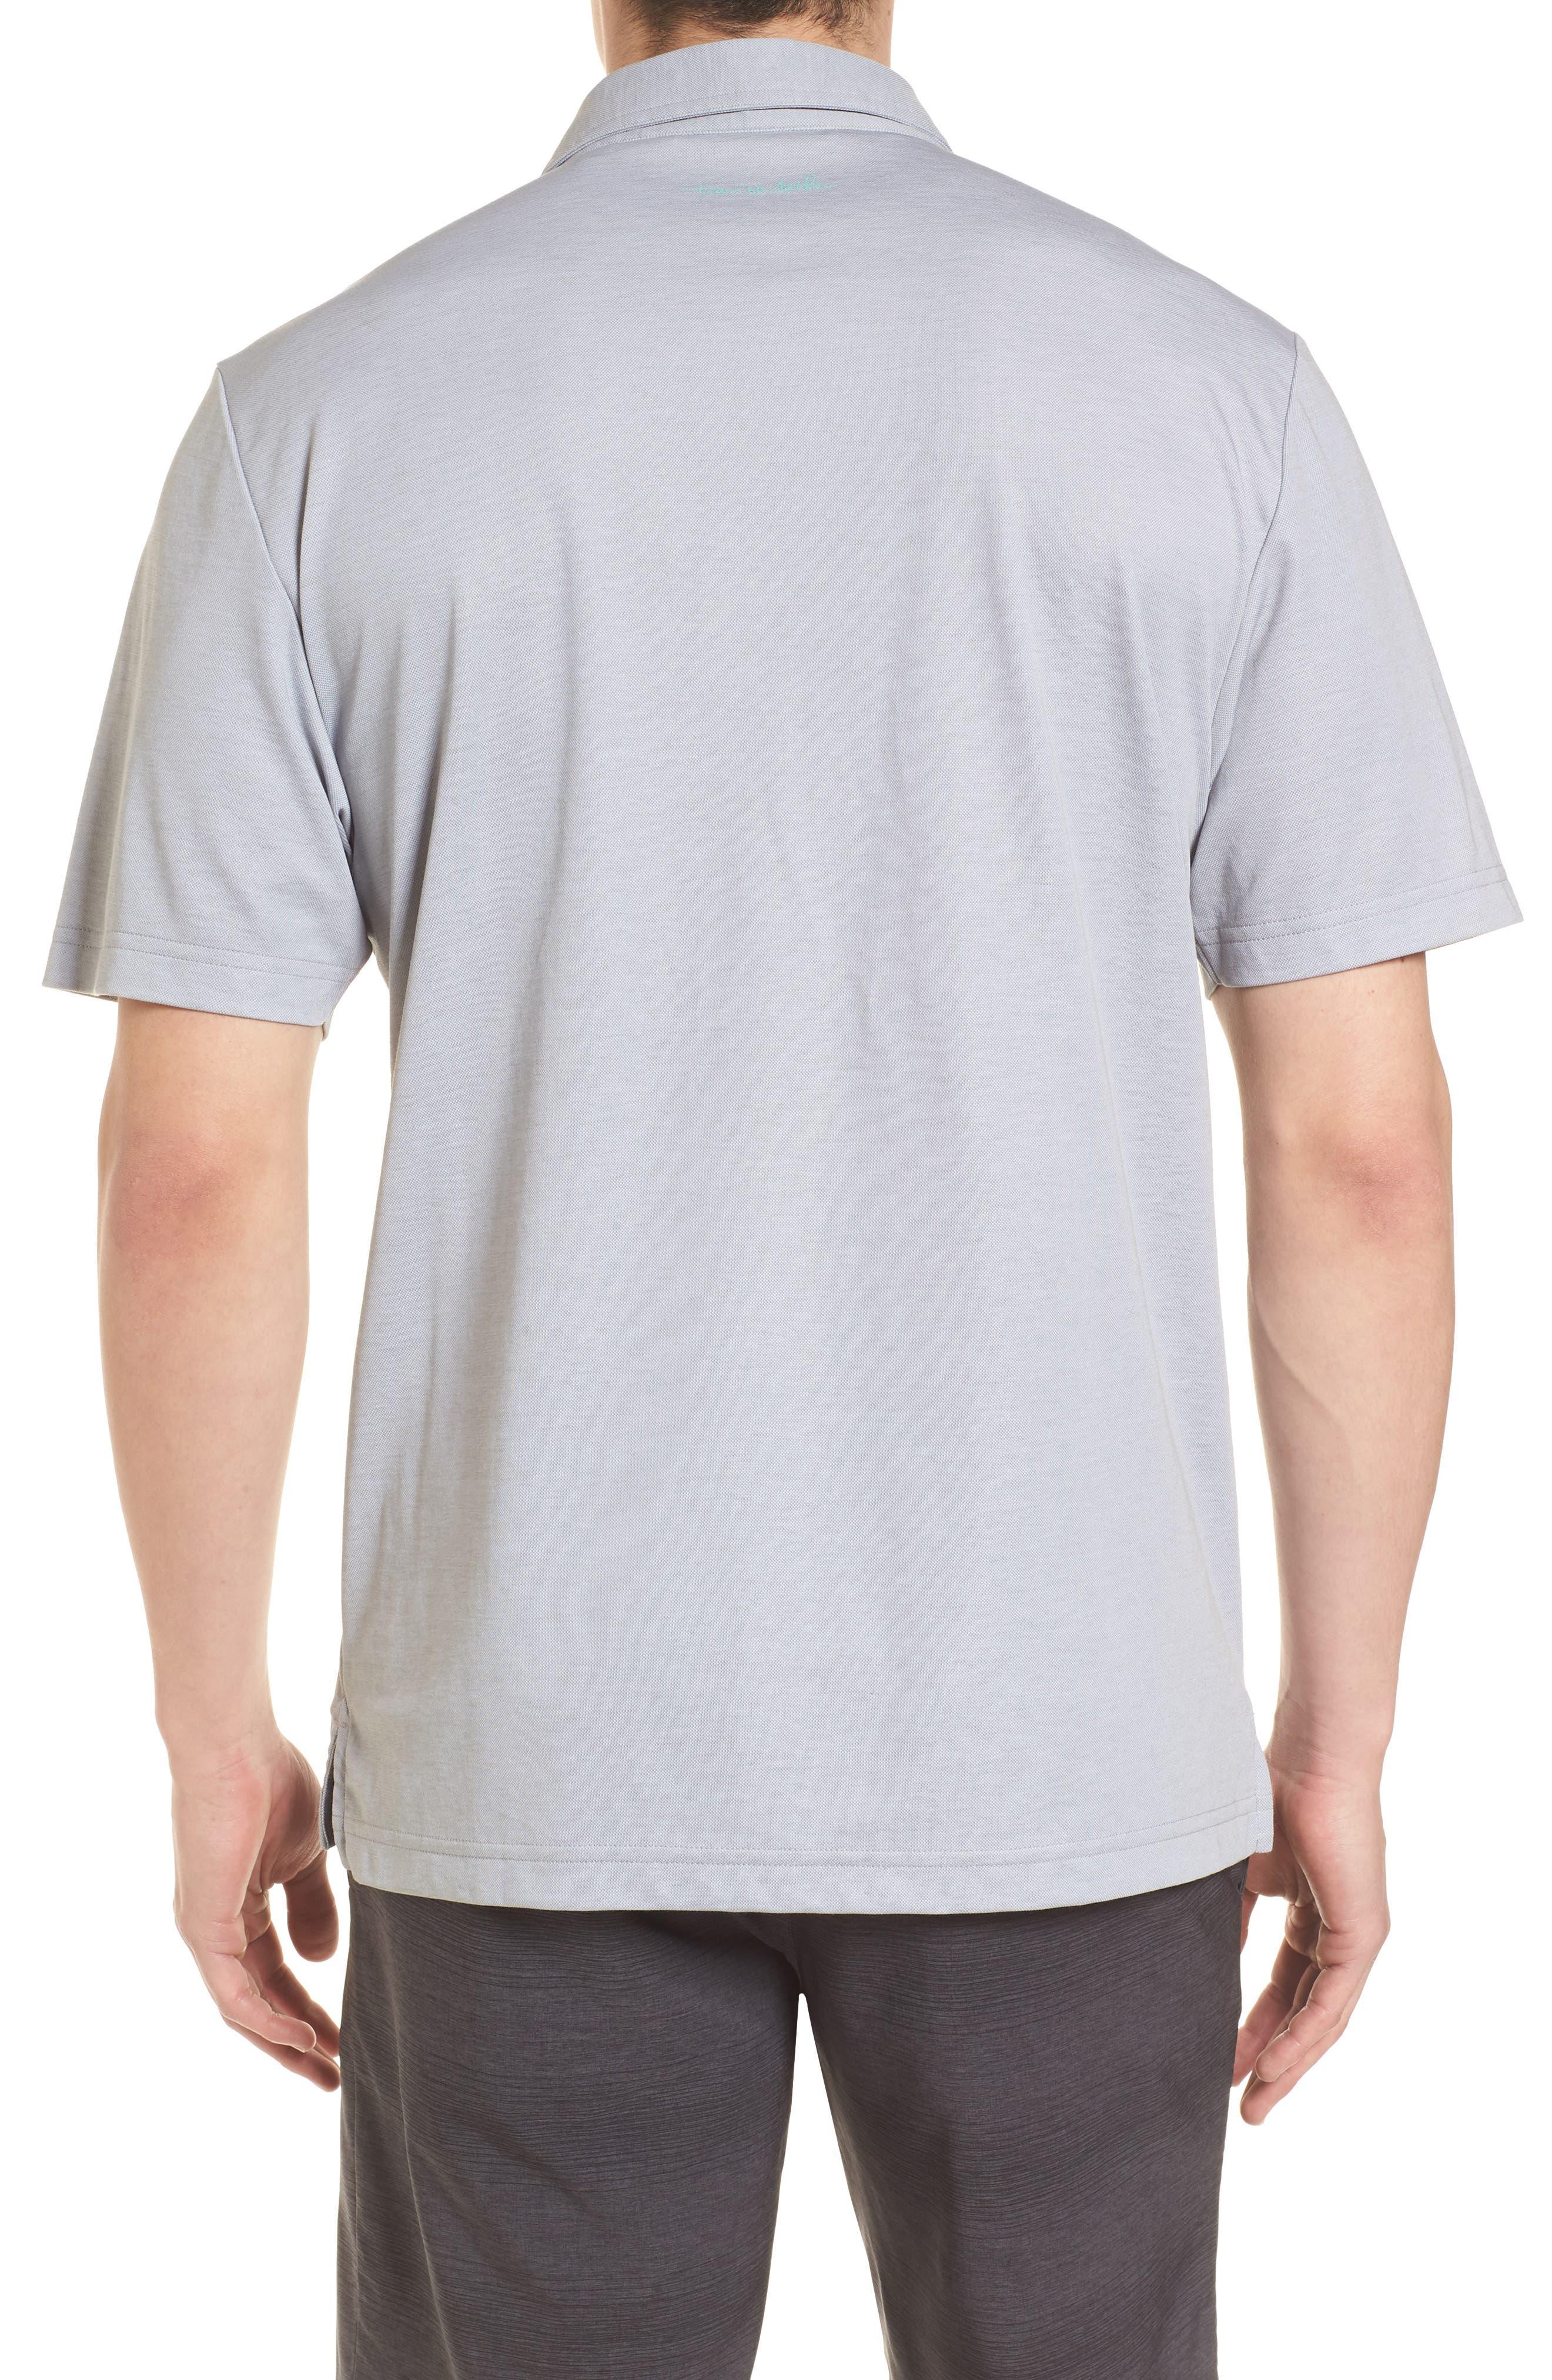 Good Good Polo Shirt,                             Alternate thumbnail 2, color,                             Heather Grey Monument